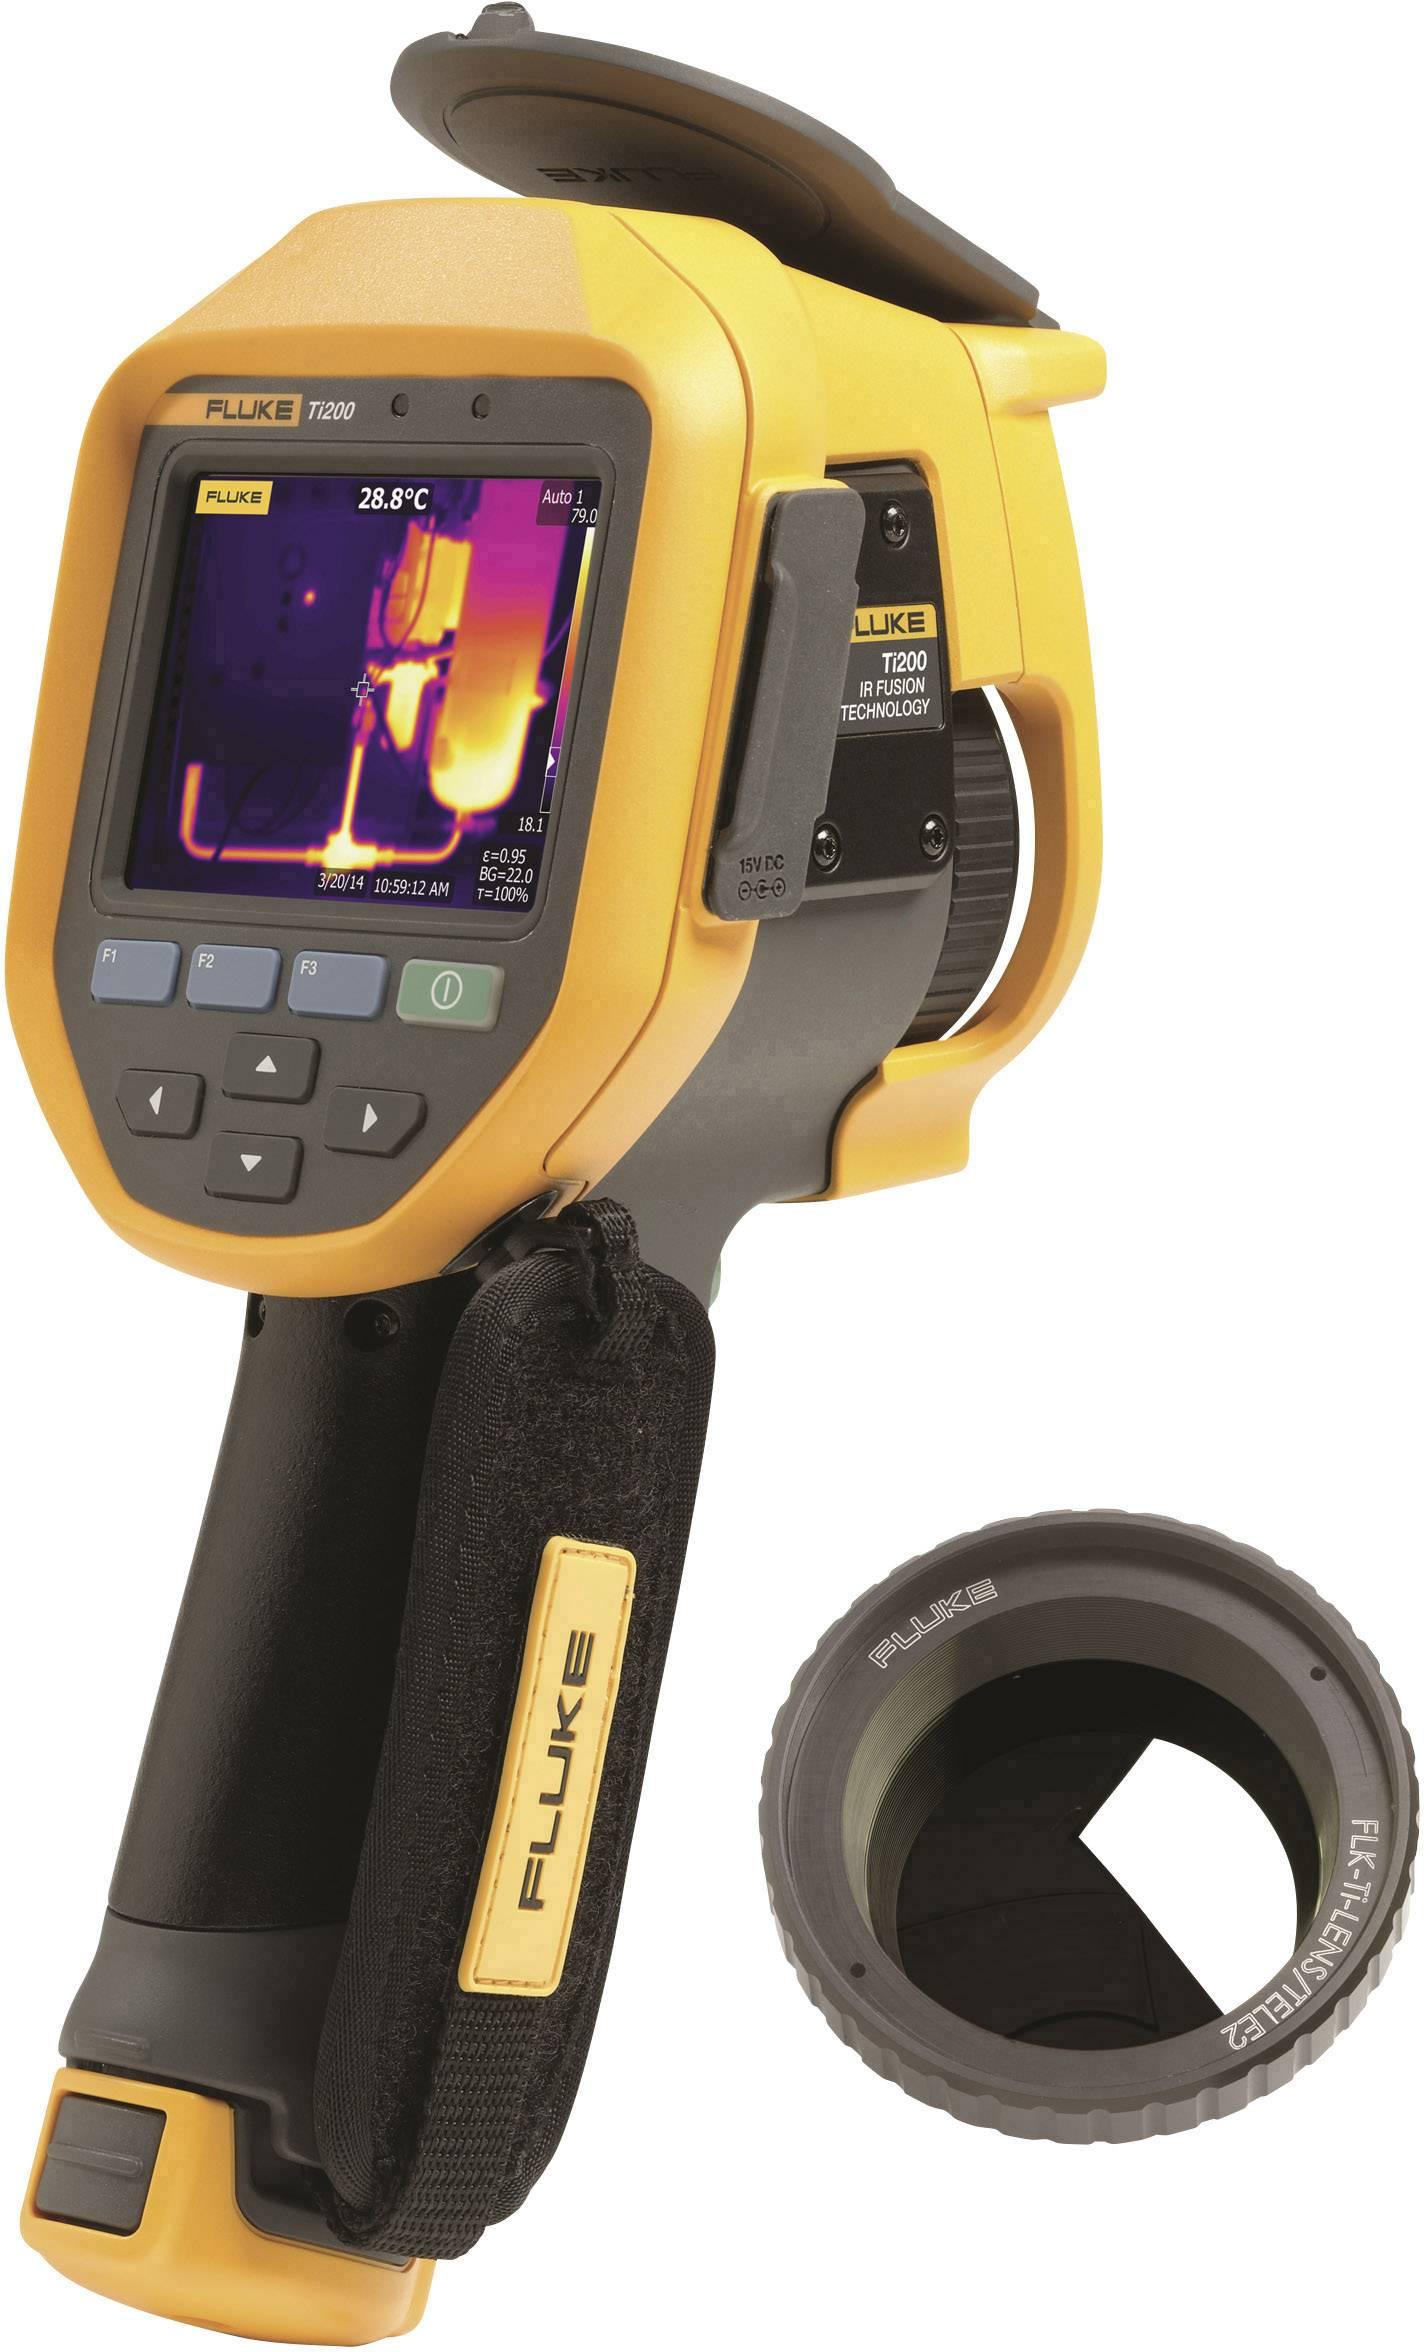 Termokamera Fluke FLK-TI200 9HZ/T2 4611407, 200 x 150 pix